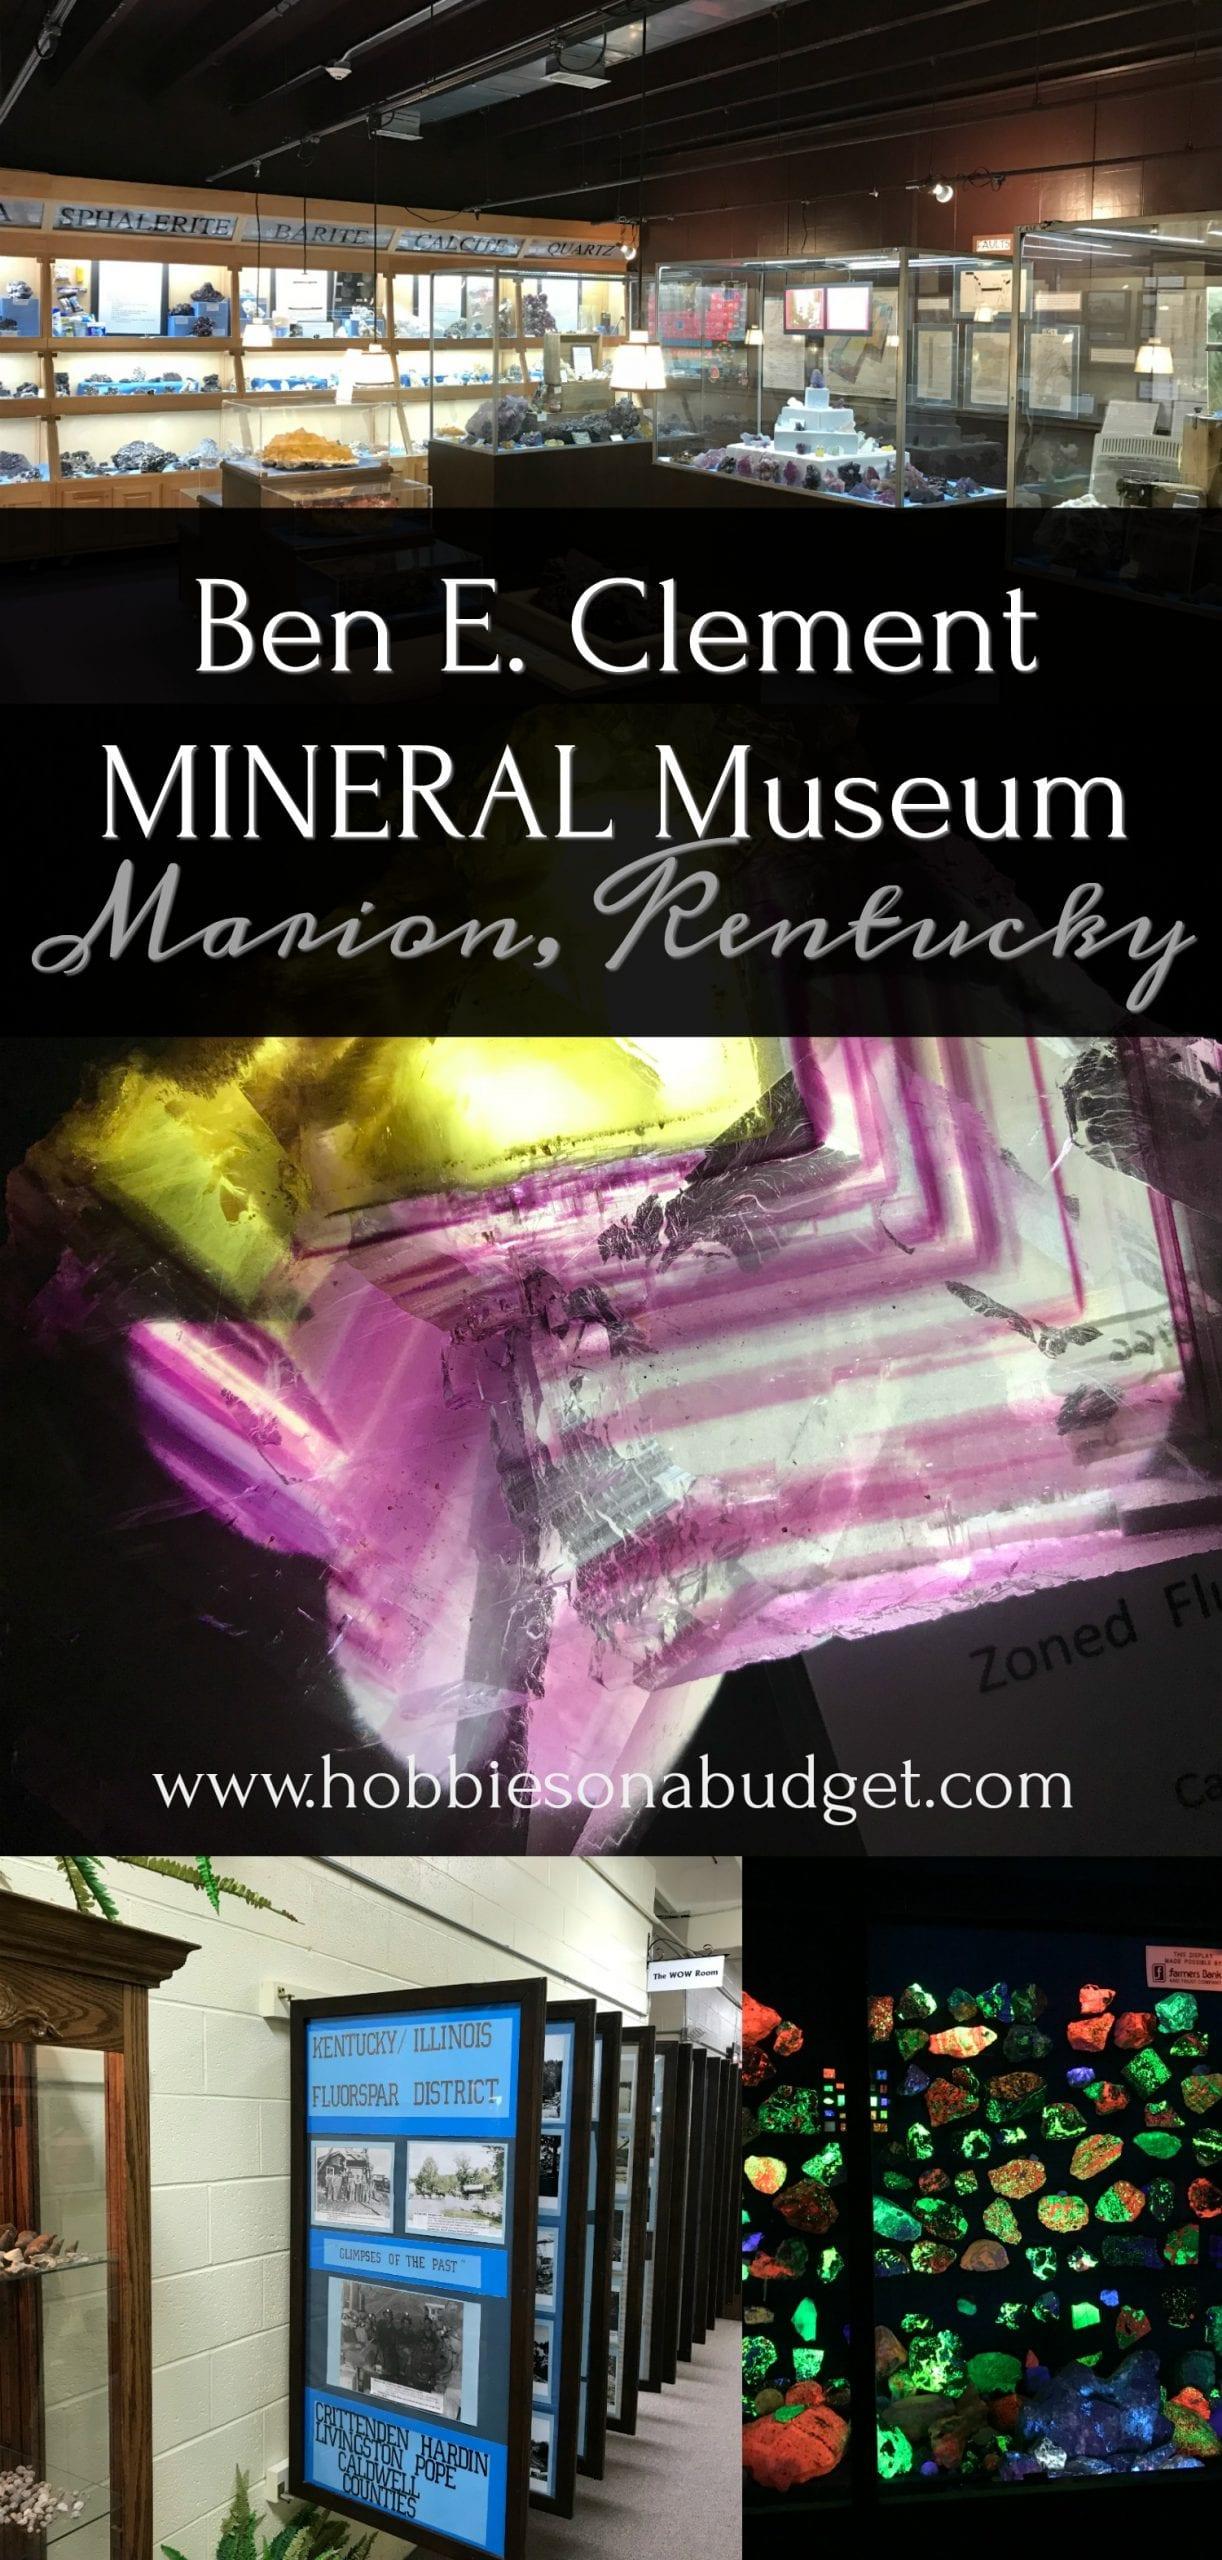 Ben E. Clement Mineral Museum